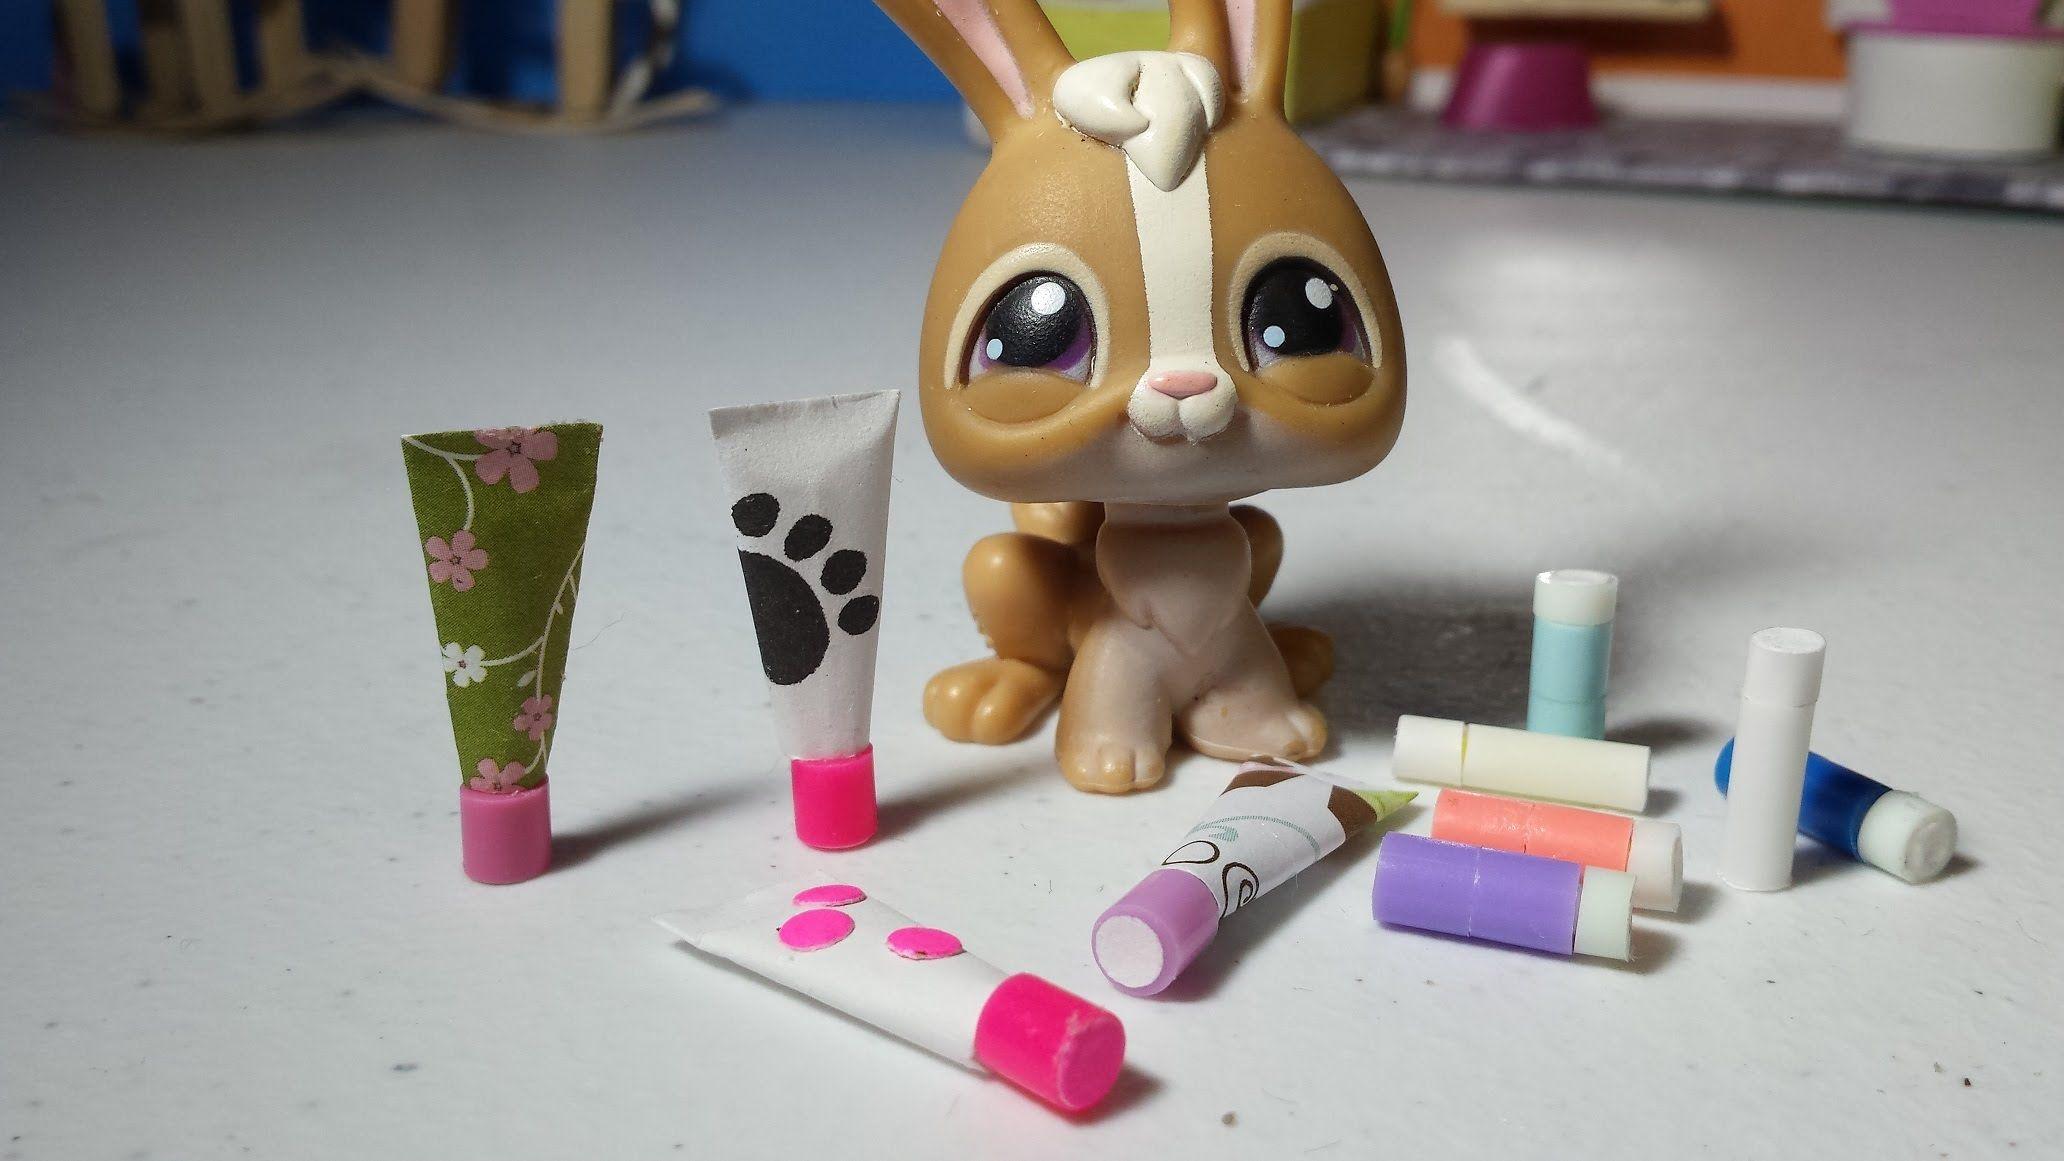 Rainbow bathroom accessories - Best 20 Lps Diy Accessories Ideas On Pinterest Lps Accessories Lps And Barbie Stuff